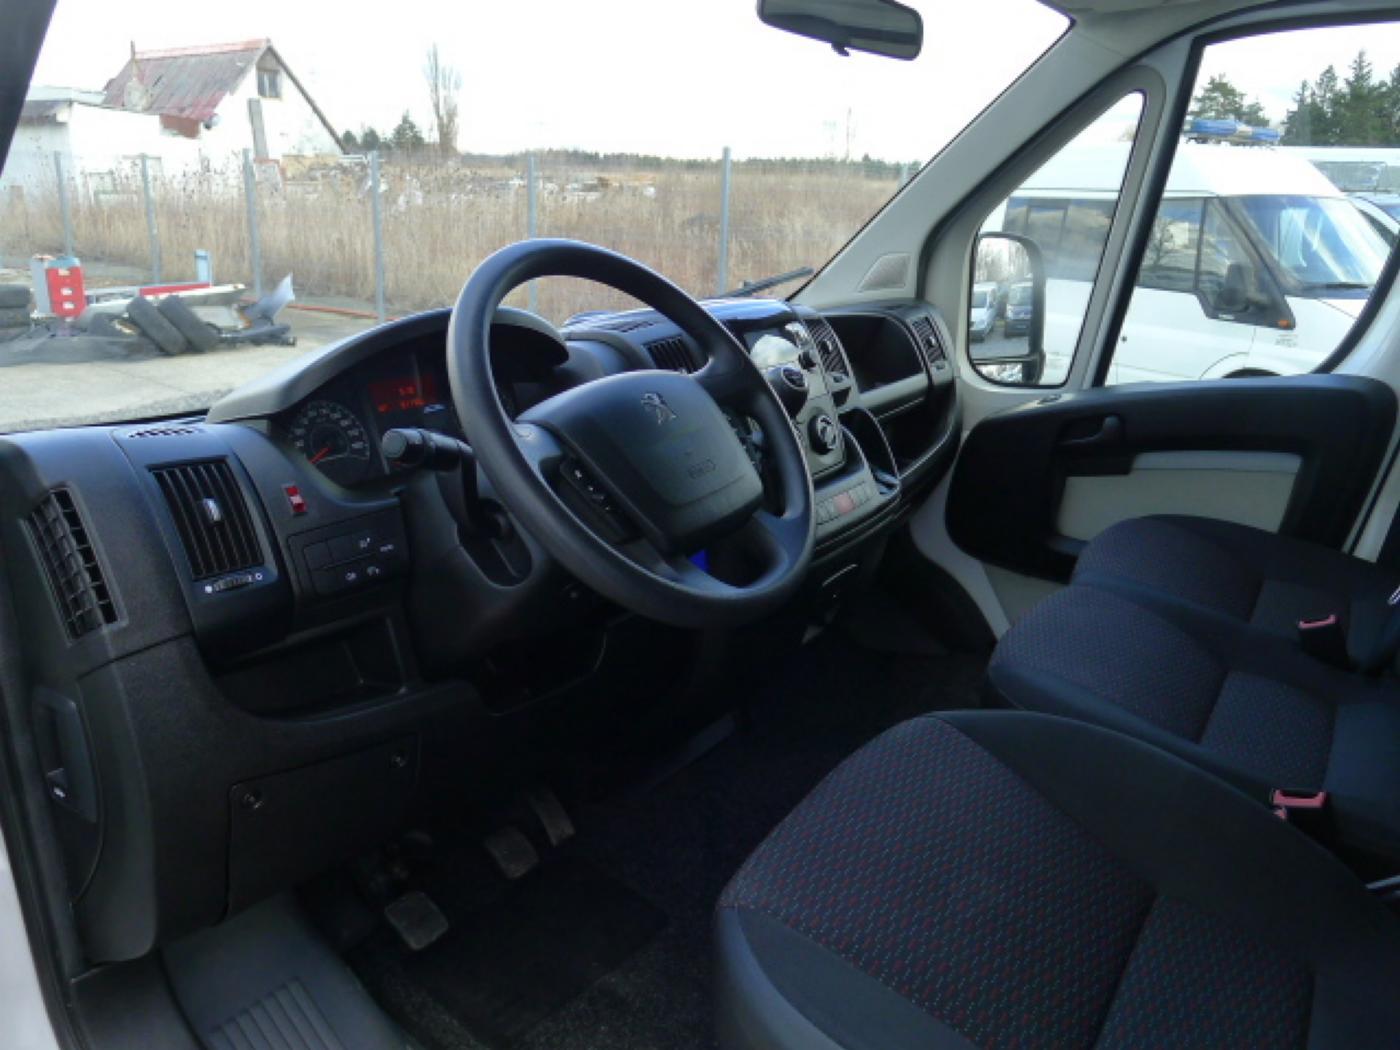 Peugeot Boxer 2,2 HDI Valnik+Plachta+Klima+Mìchy - 8